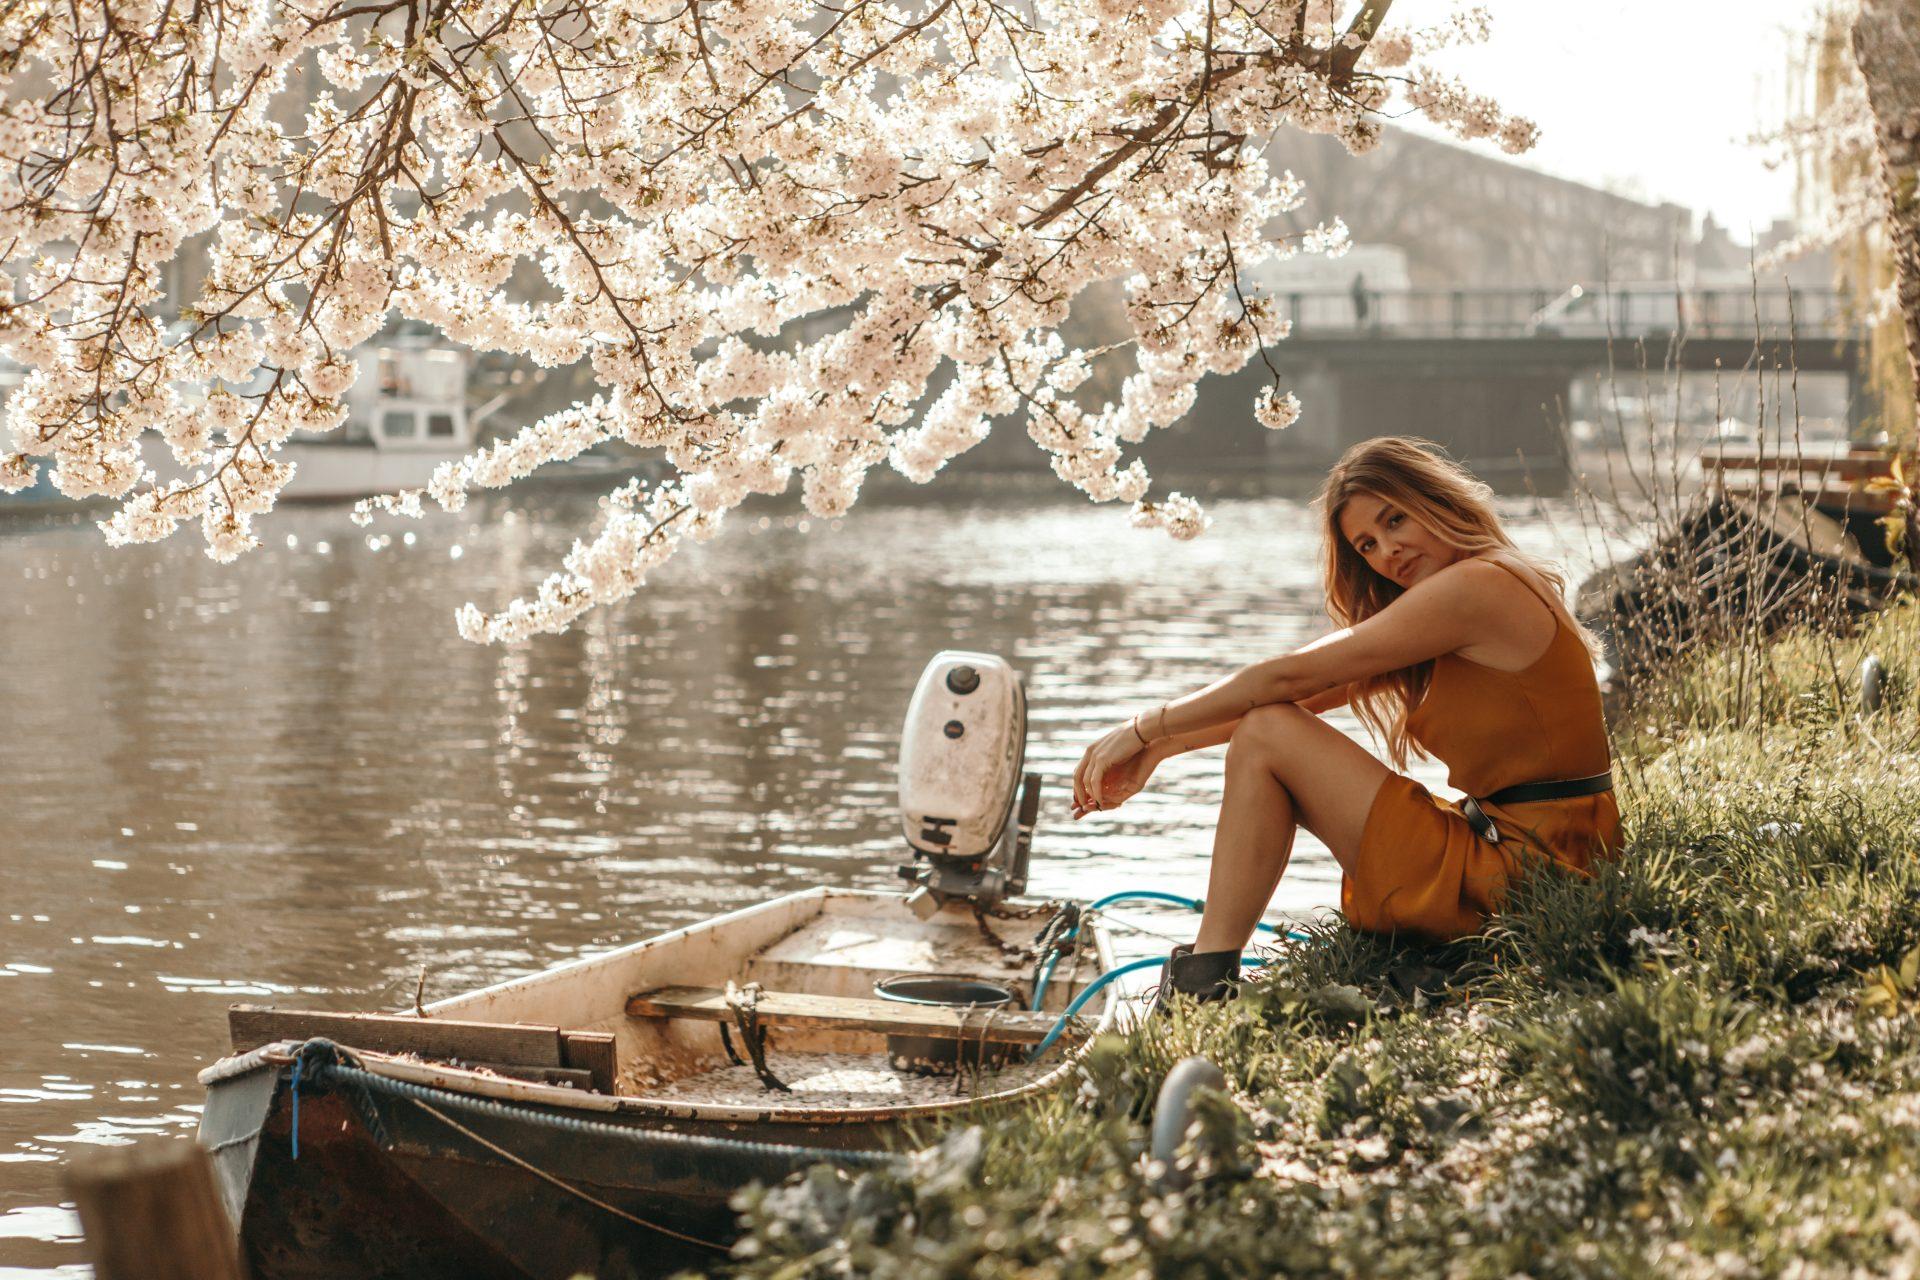 Lifestyle photoshoot by Dorin Ciobanu Photographer